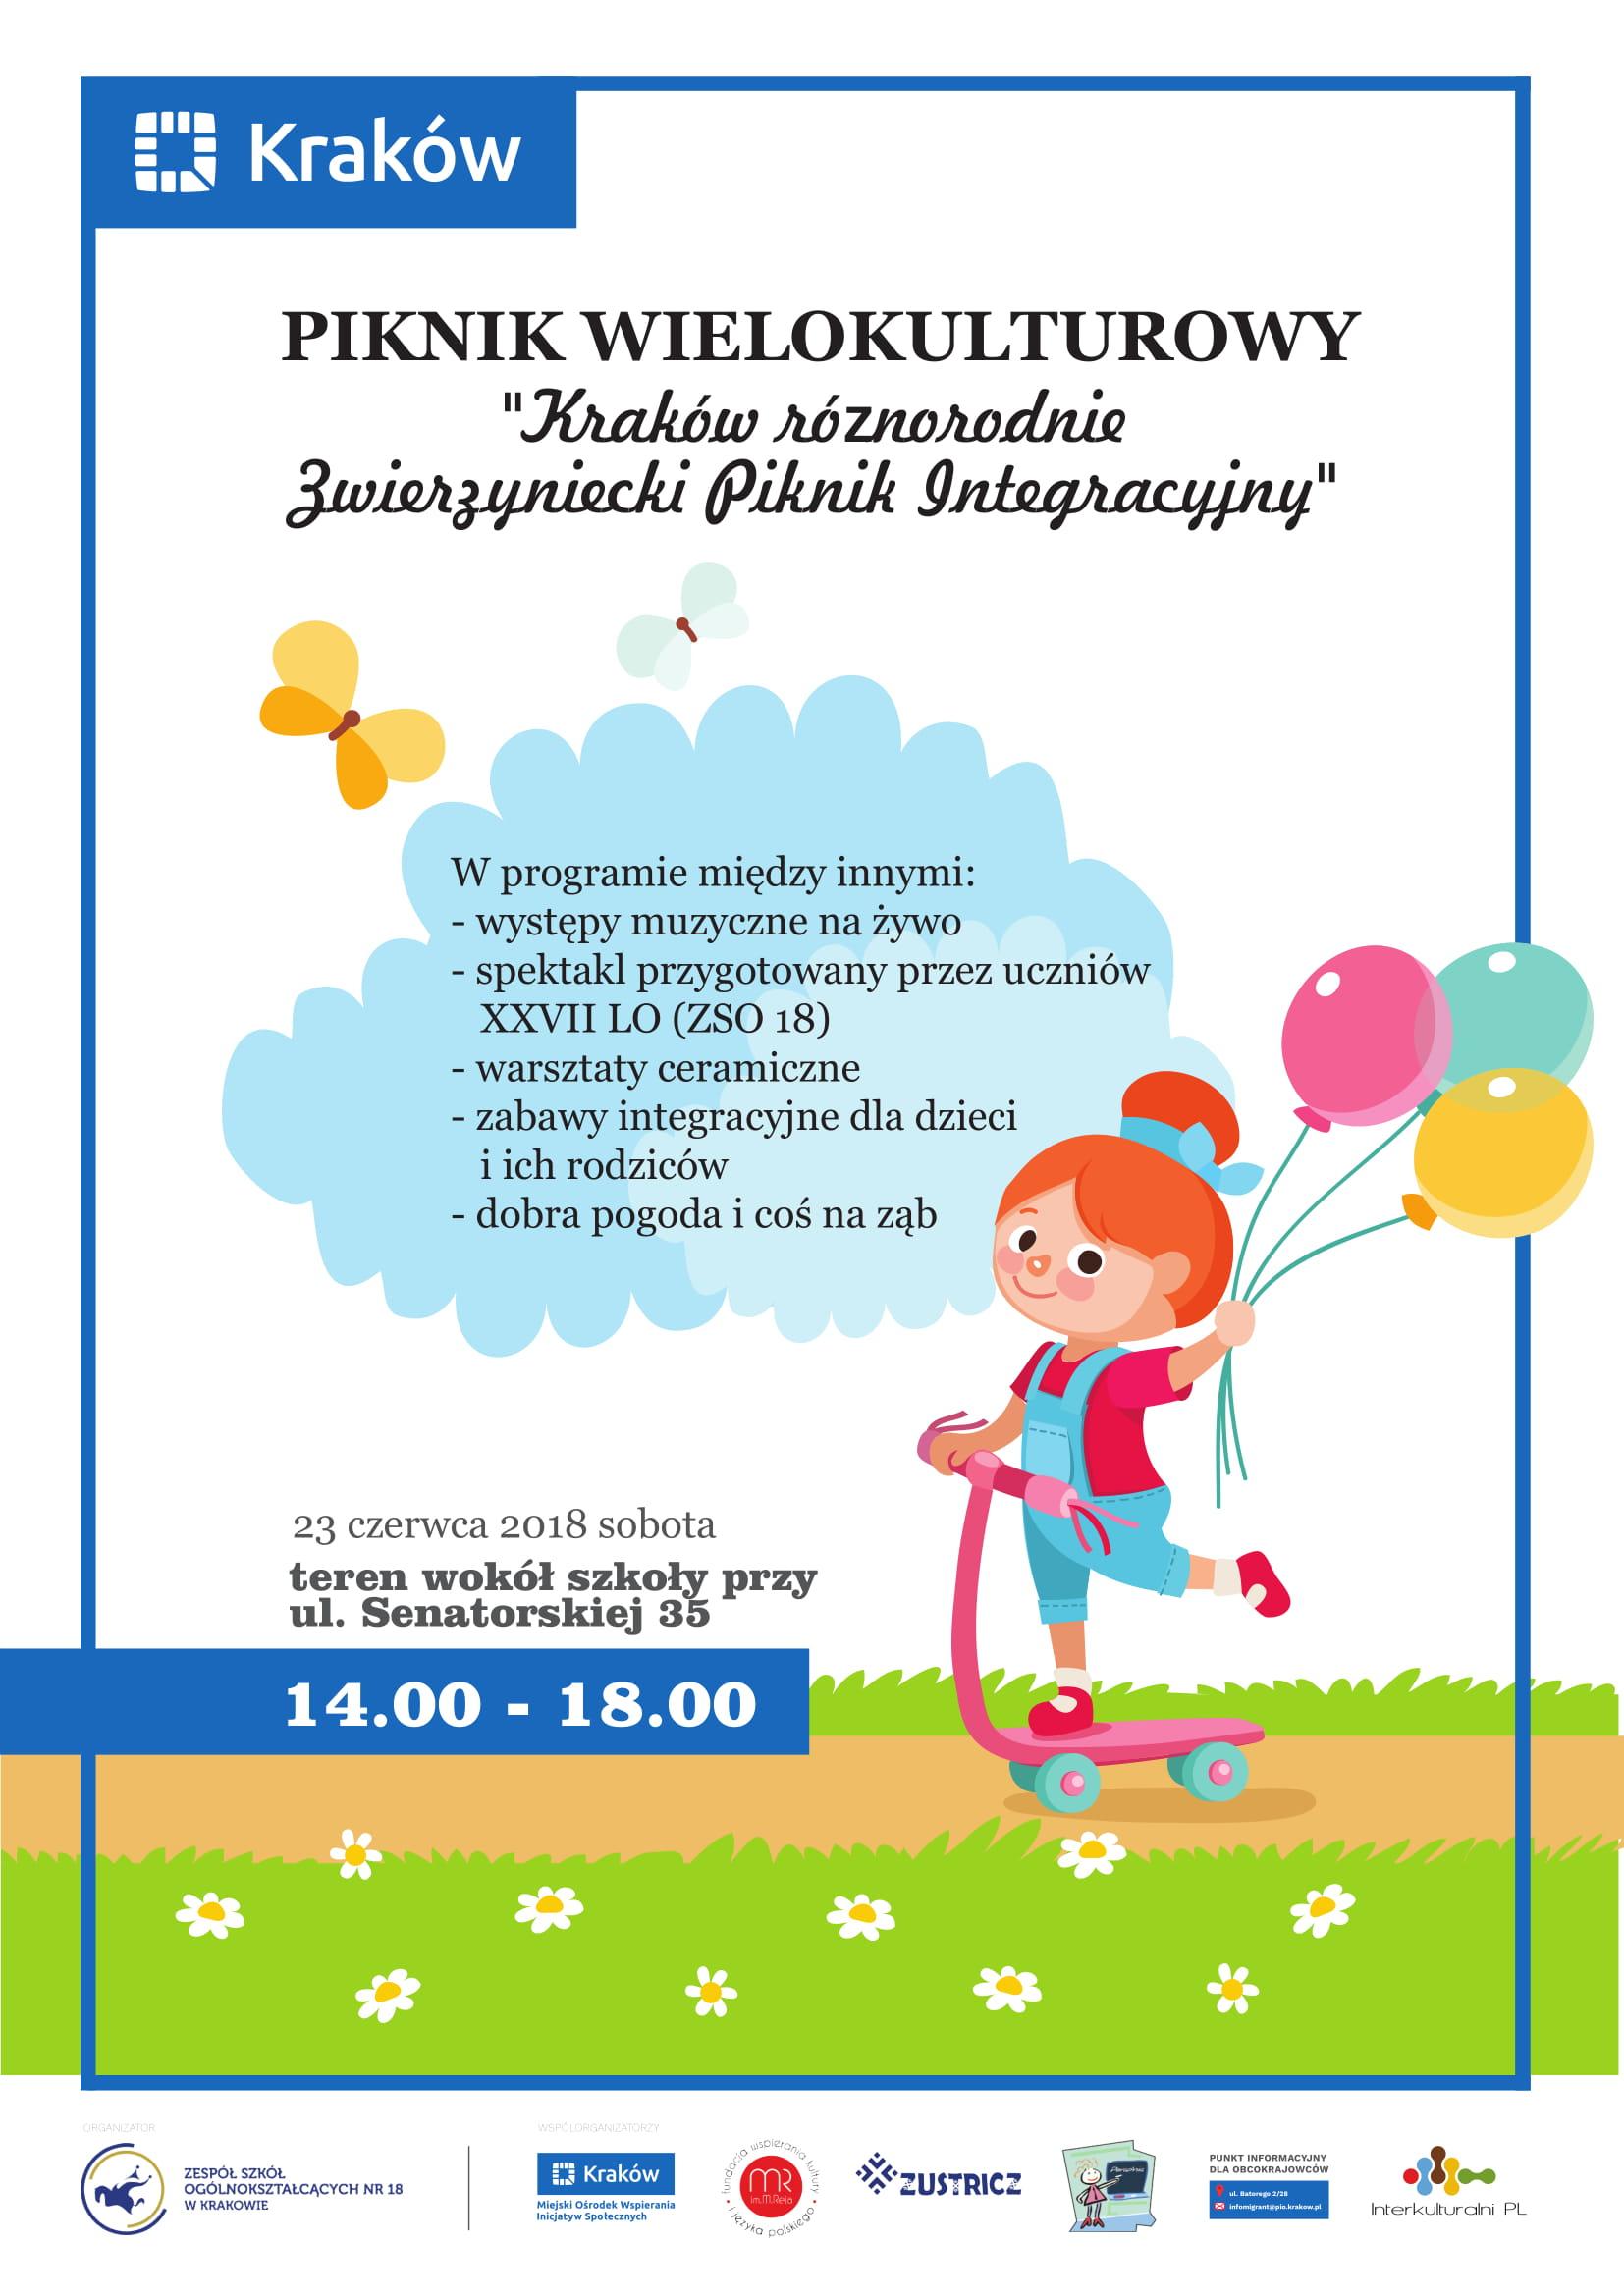 http://zso18.krakow.pl/liceum/wp-content/uploads/sites/3/2018/06/piknikwielokulturowy23062018.jpg